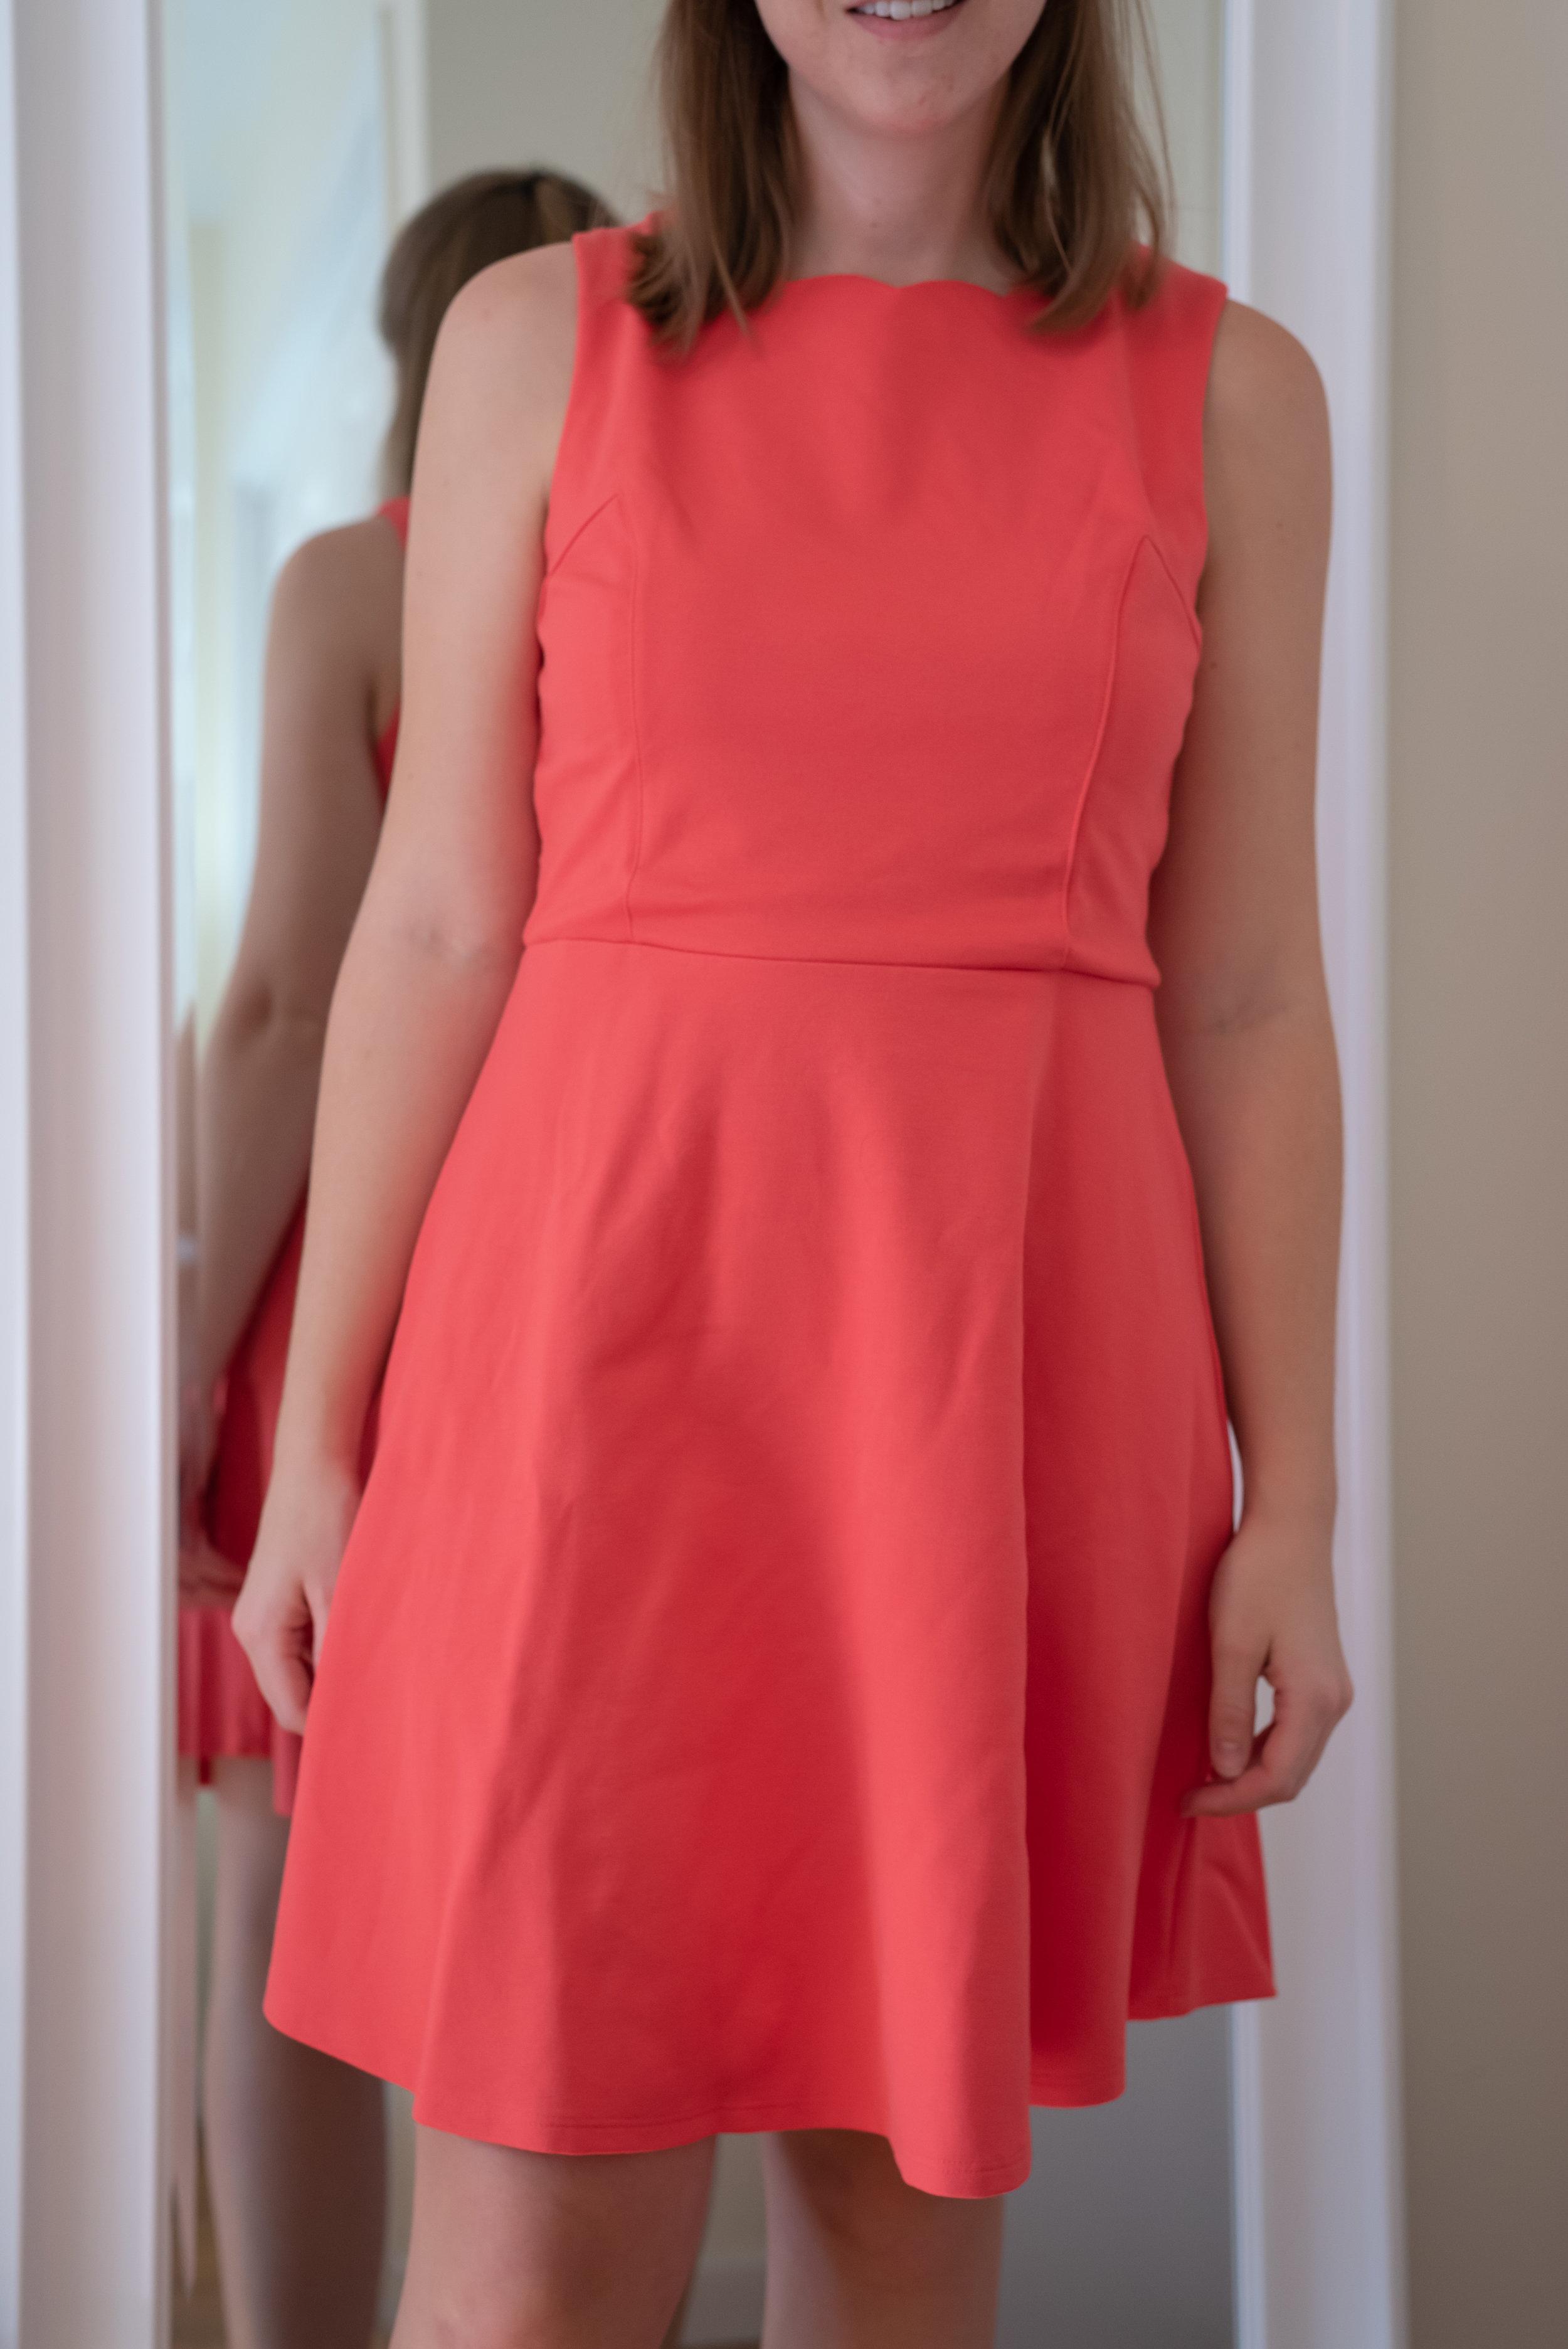 Monteau Petite Scalloped Fit & Flare Dress - Size Petite M - FRONT